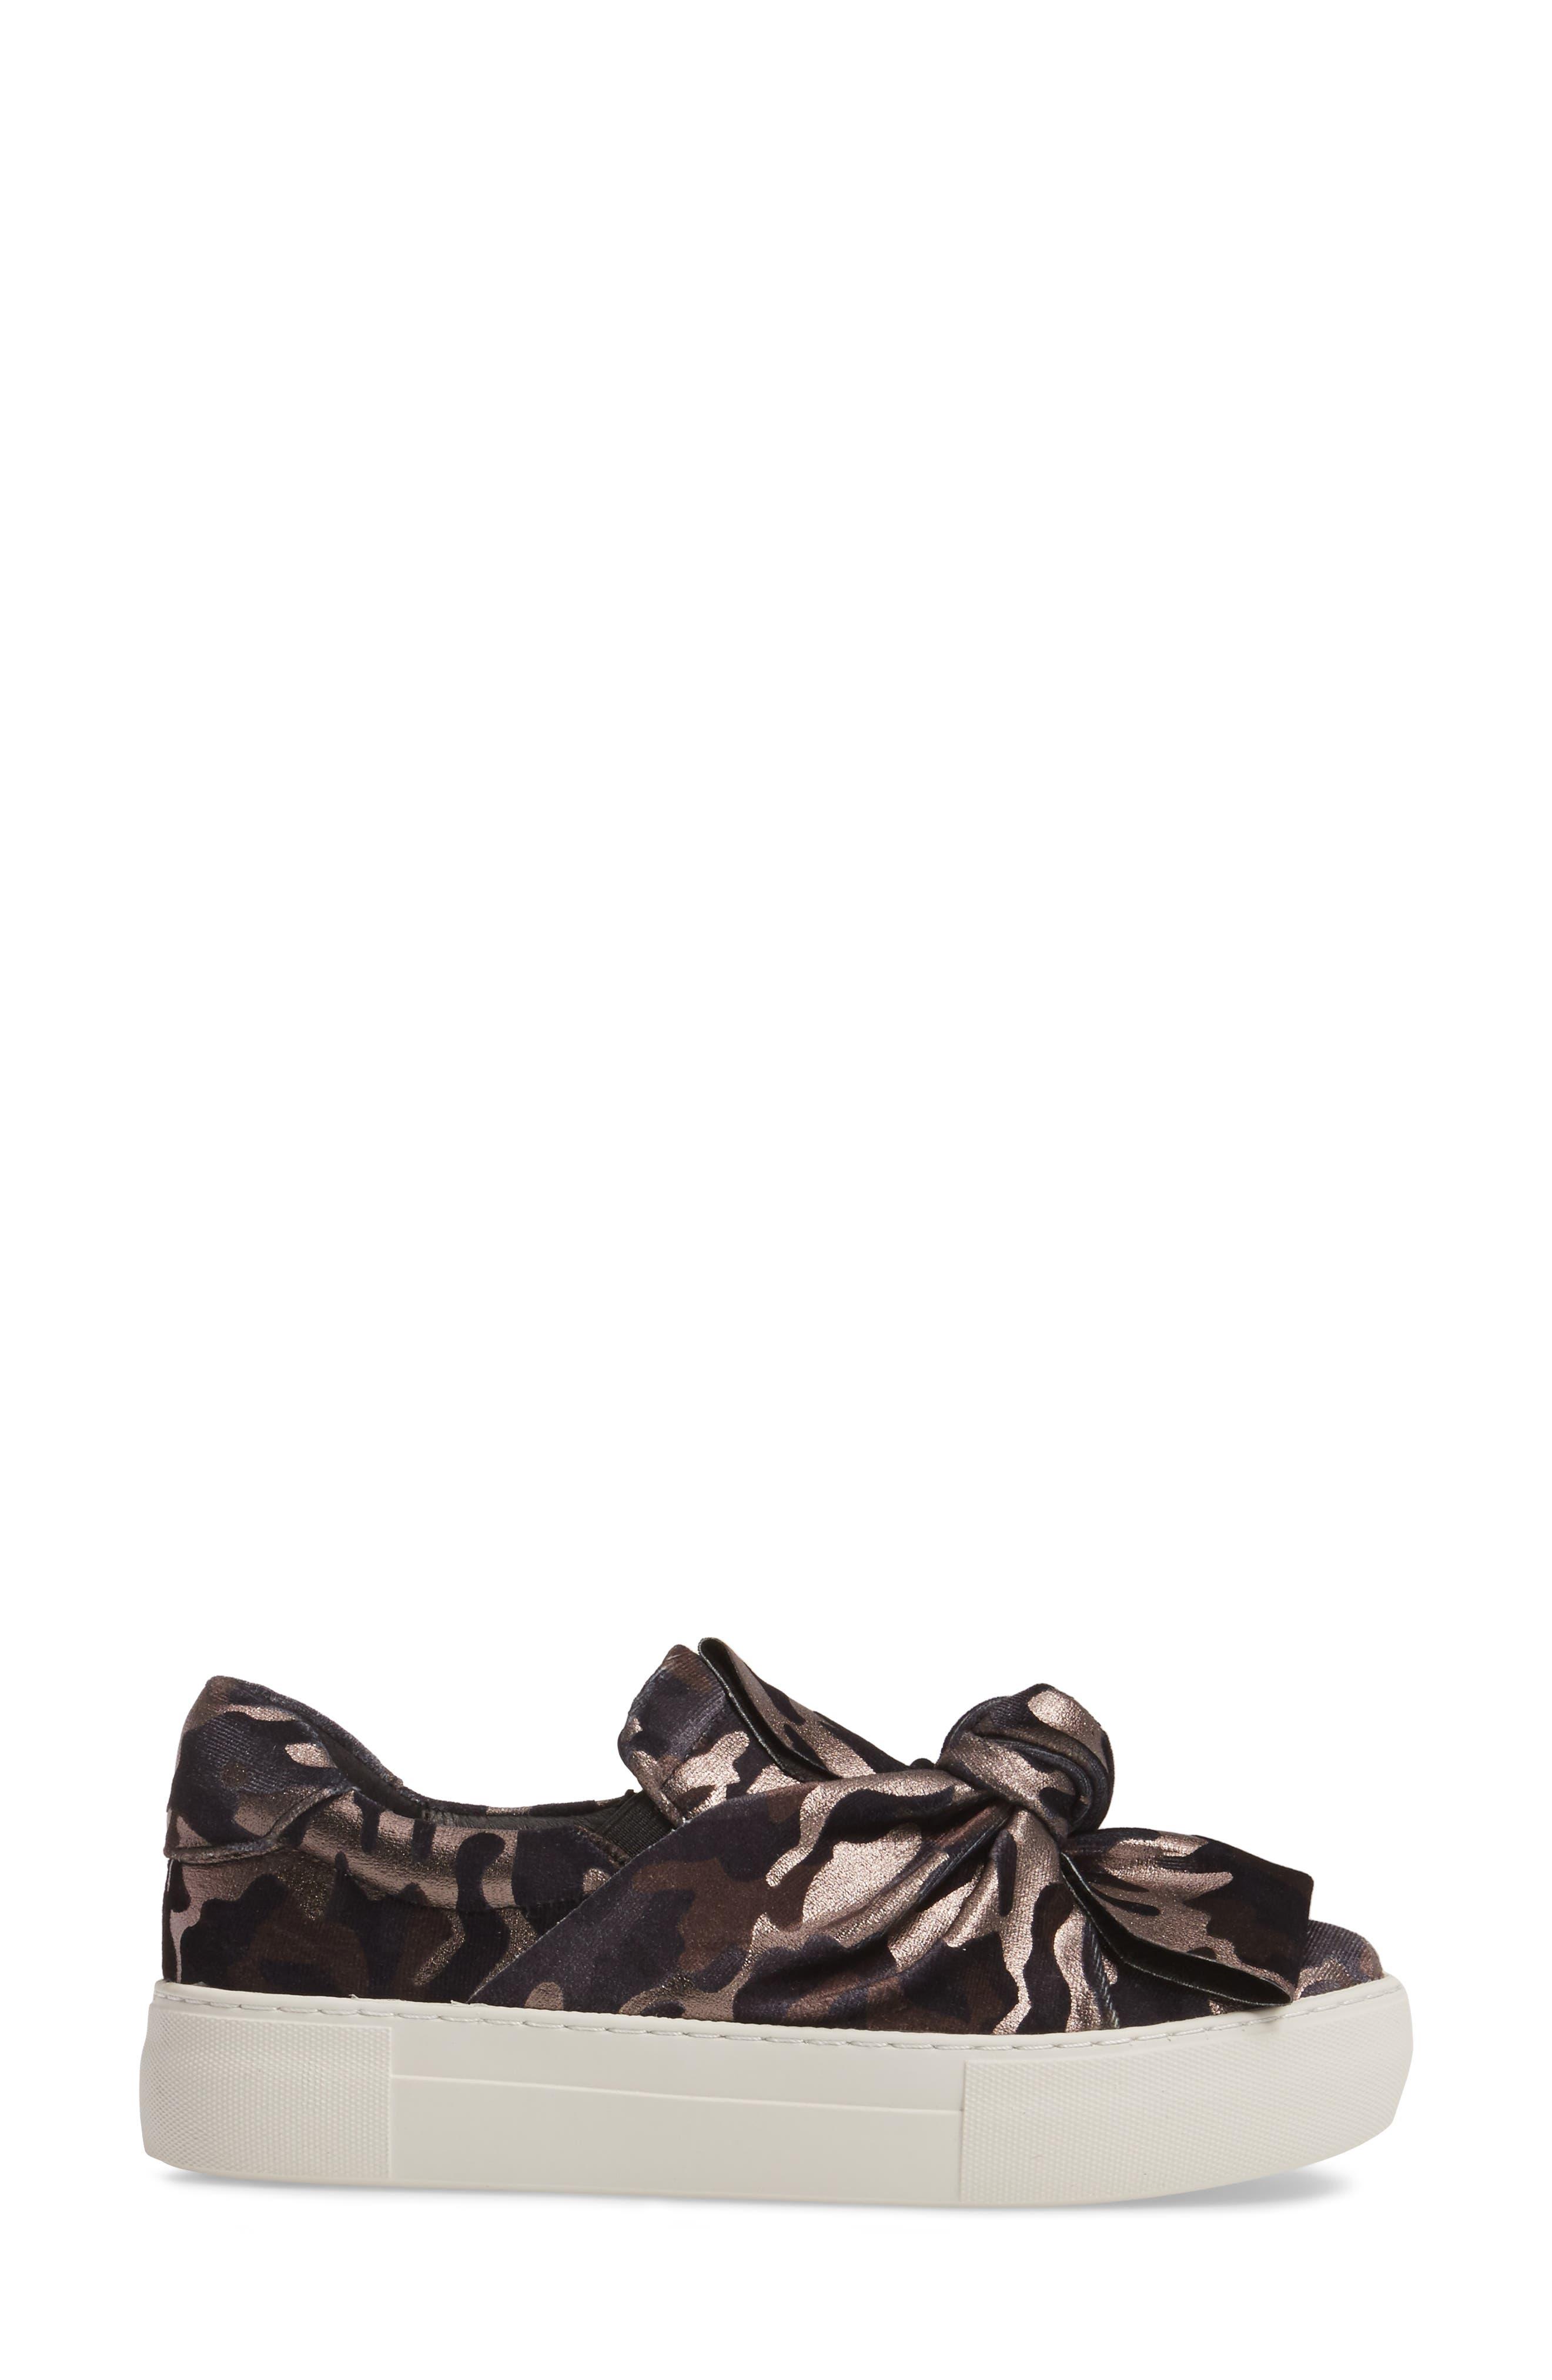 Audra Slip-On Sneaker,                             Alternate thumbnail 3, color,                             Black Camo Fabric